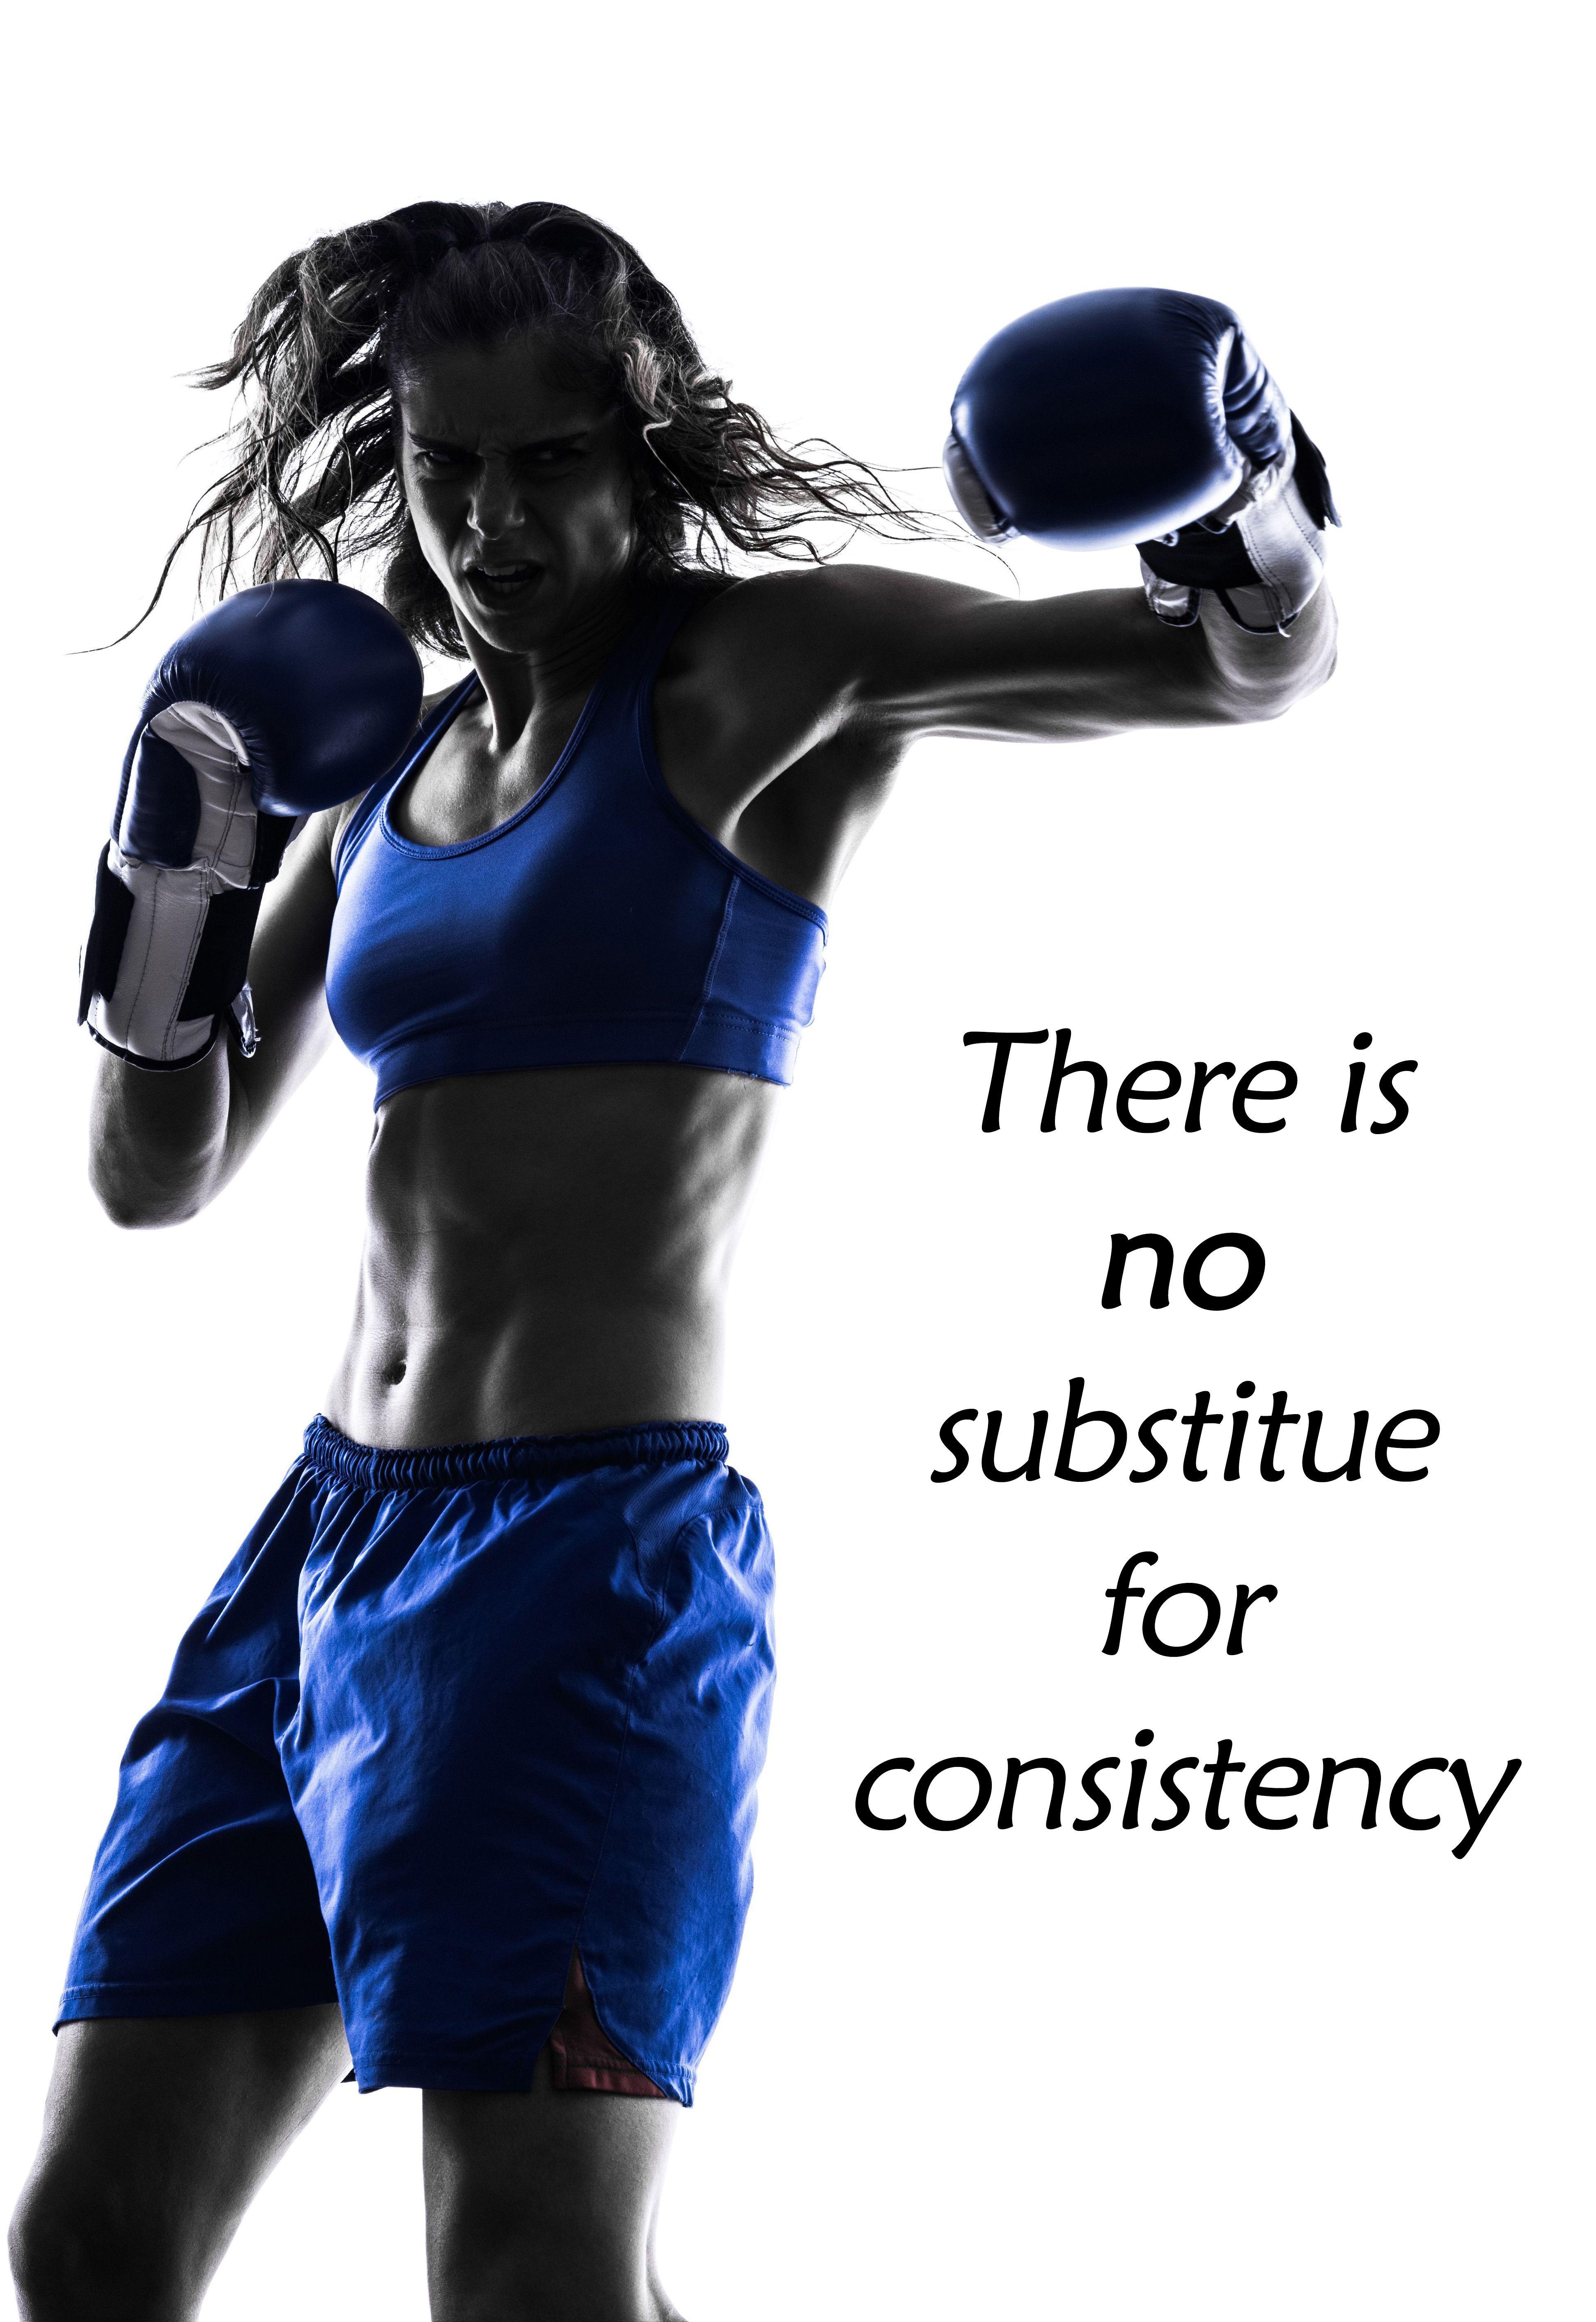 Personal Training Functional Fitness Coaching Intense Interval Training Body Weight Calisthenics Plyometrics Kickboxing Motivation Kickboxing Martial Arts